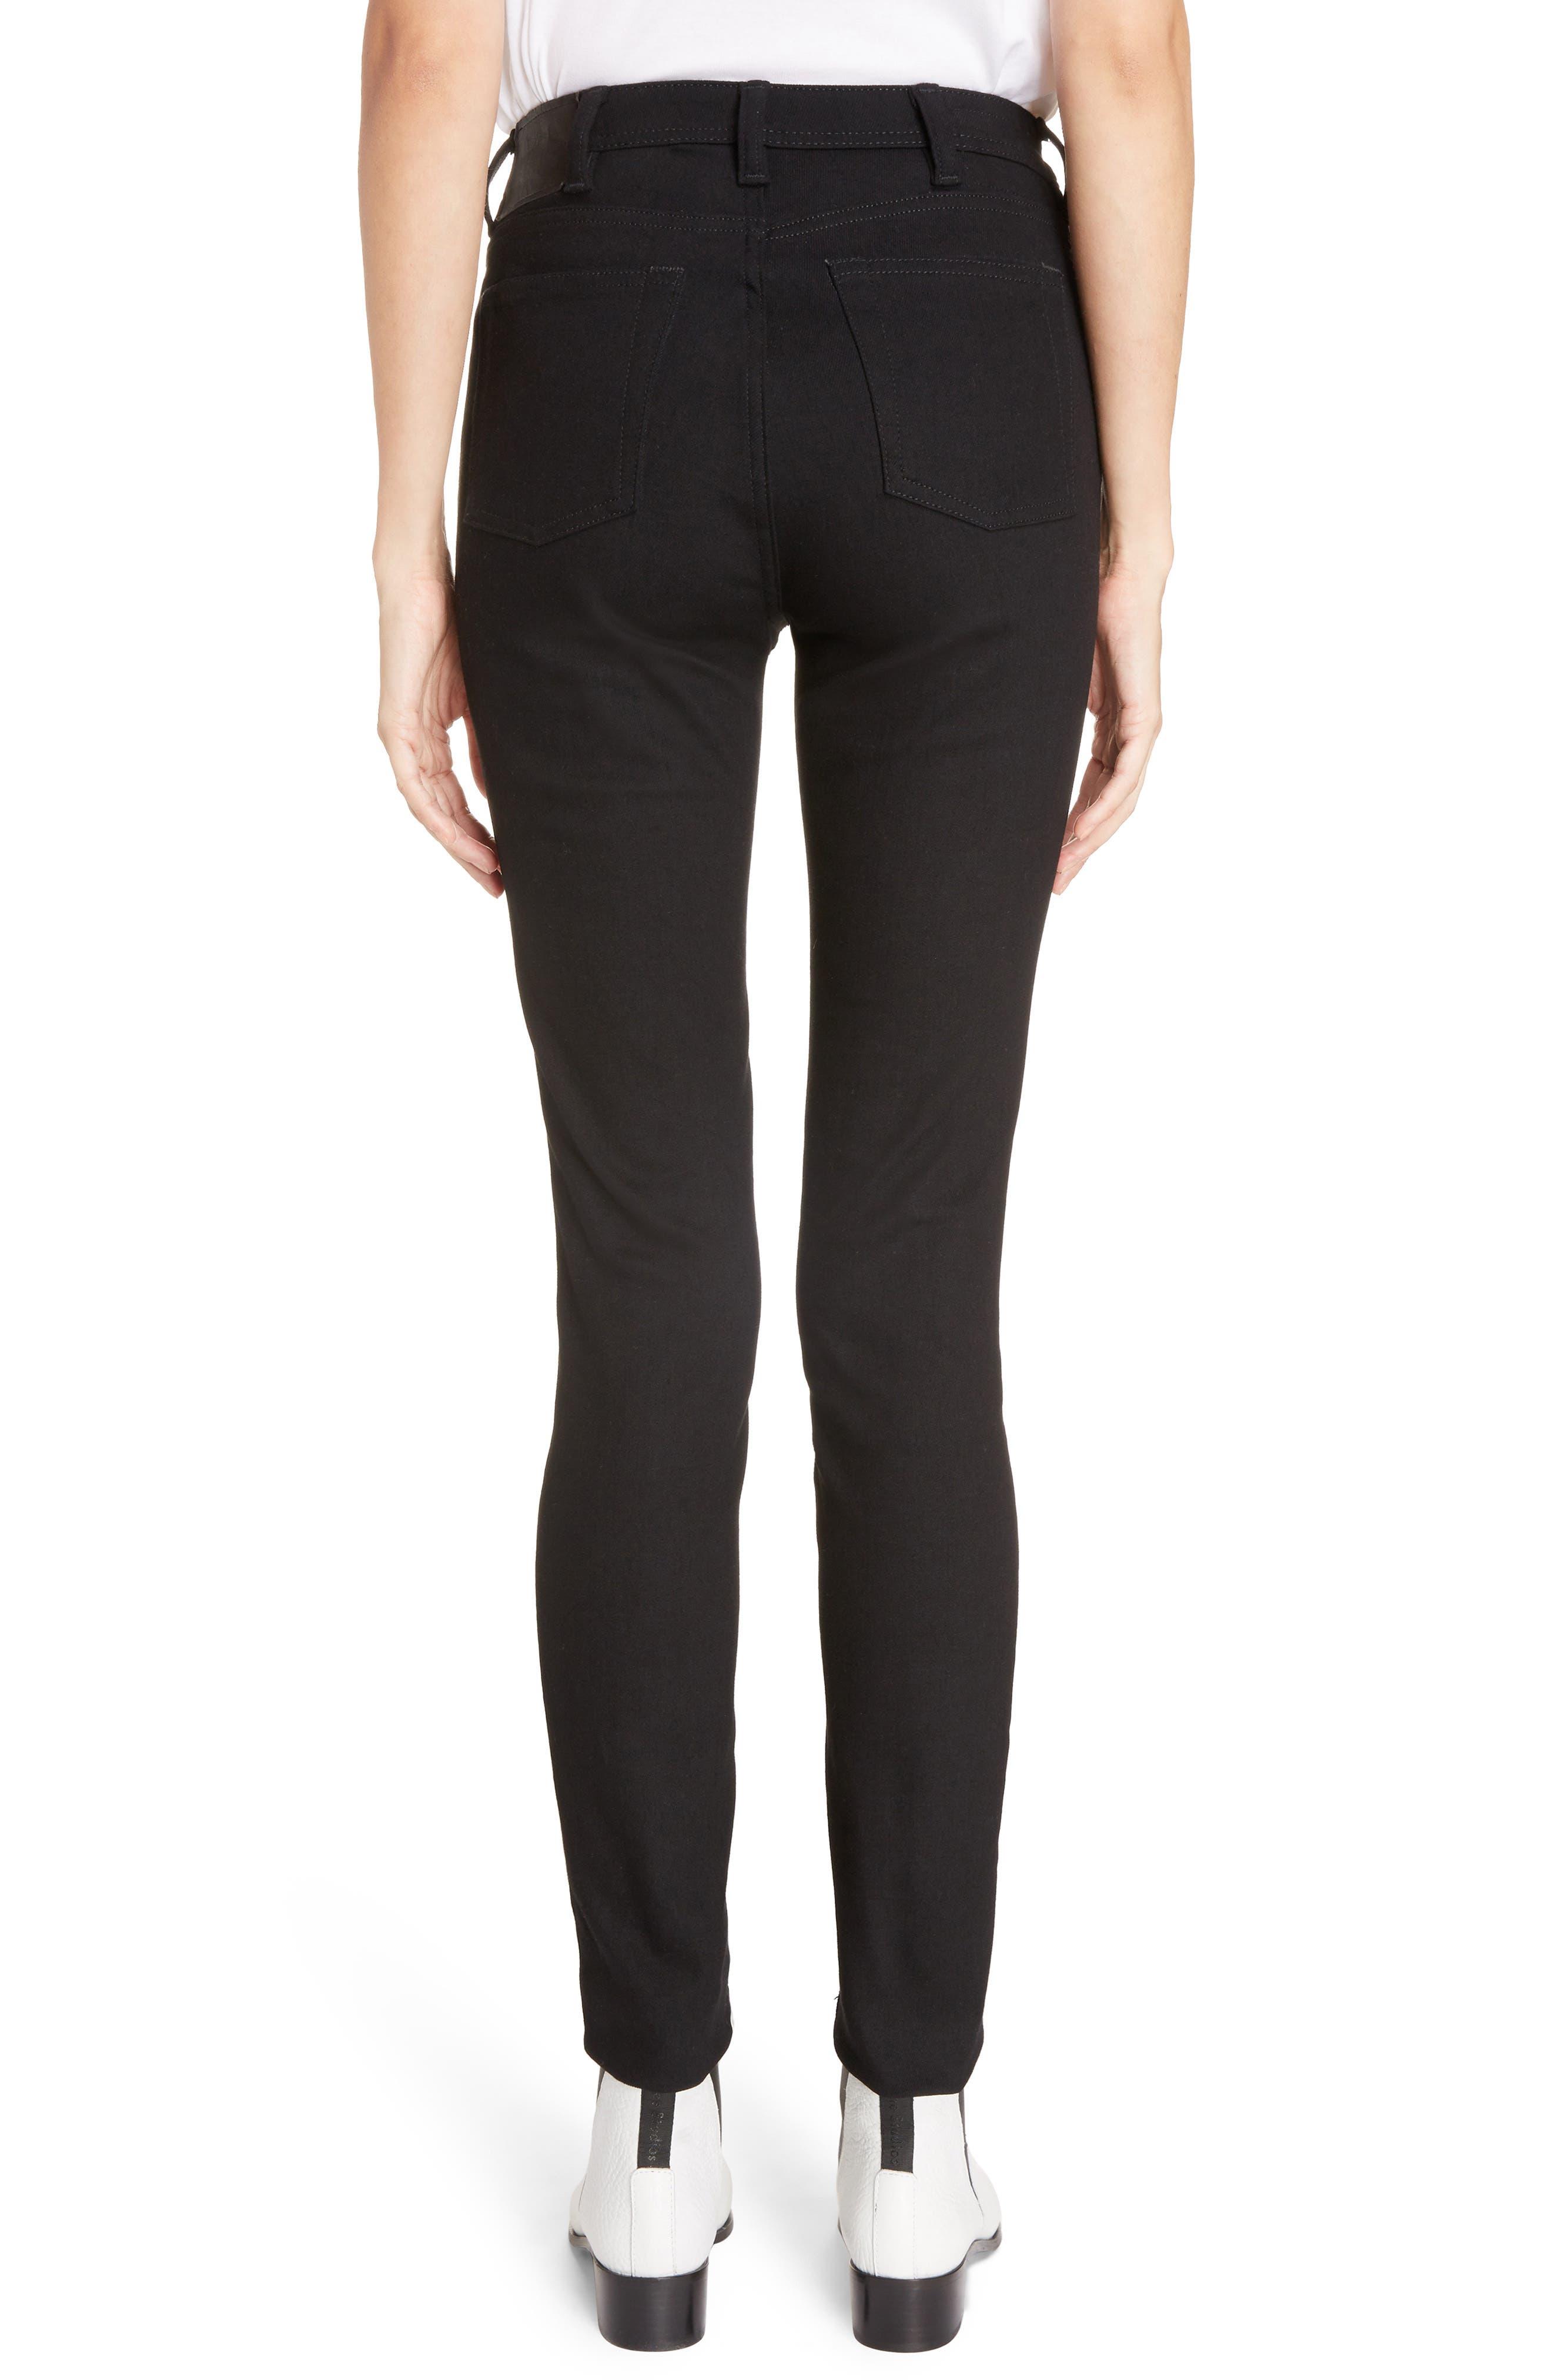 Peg High Waist Skinny Jeans,                             Alternate thumbnail 2, color,                             BLACK